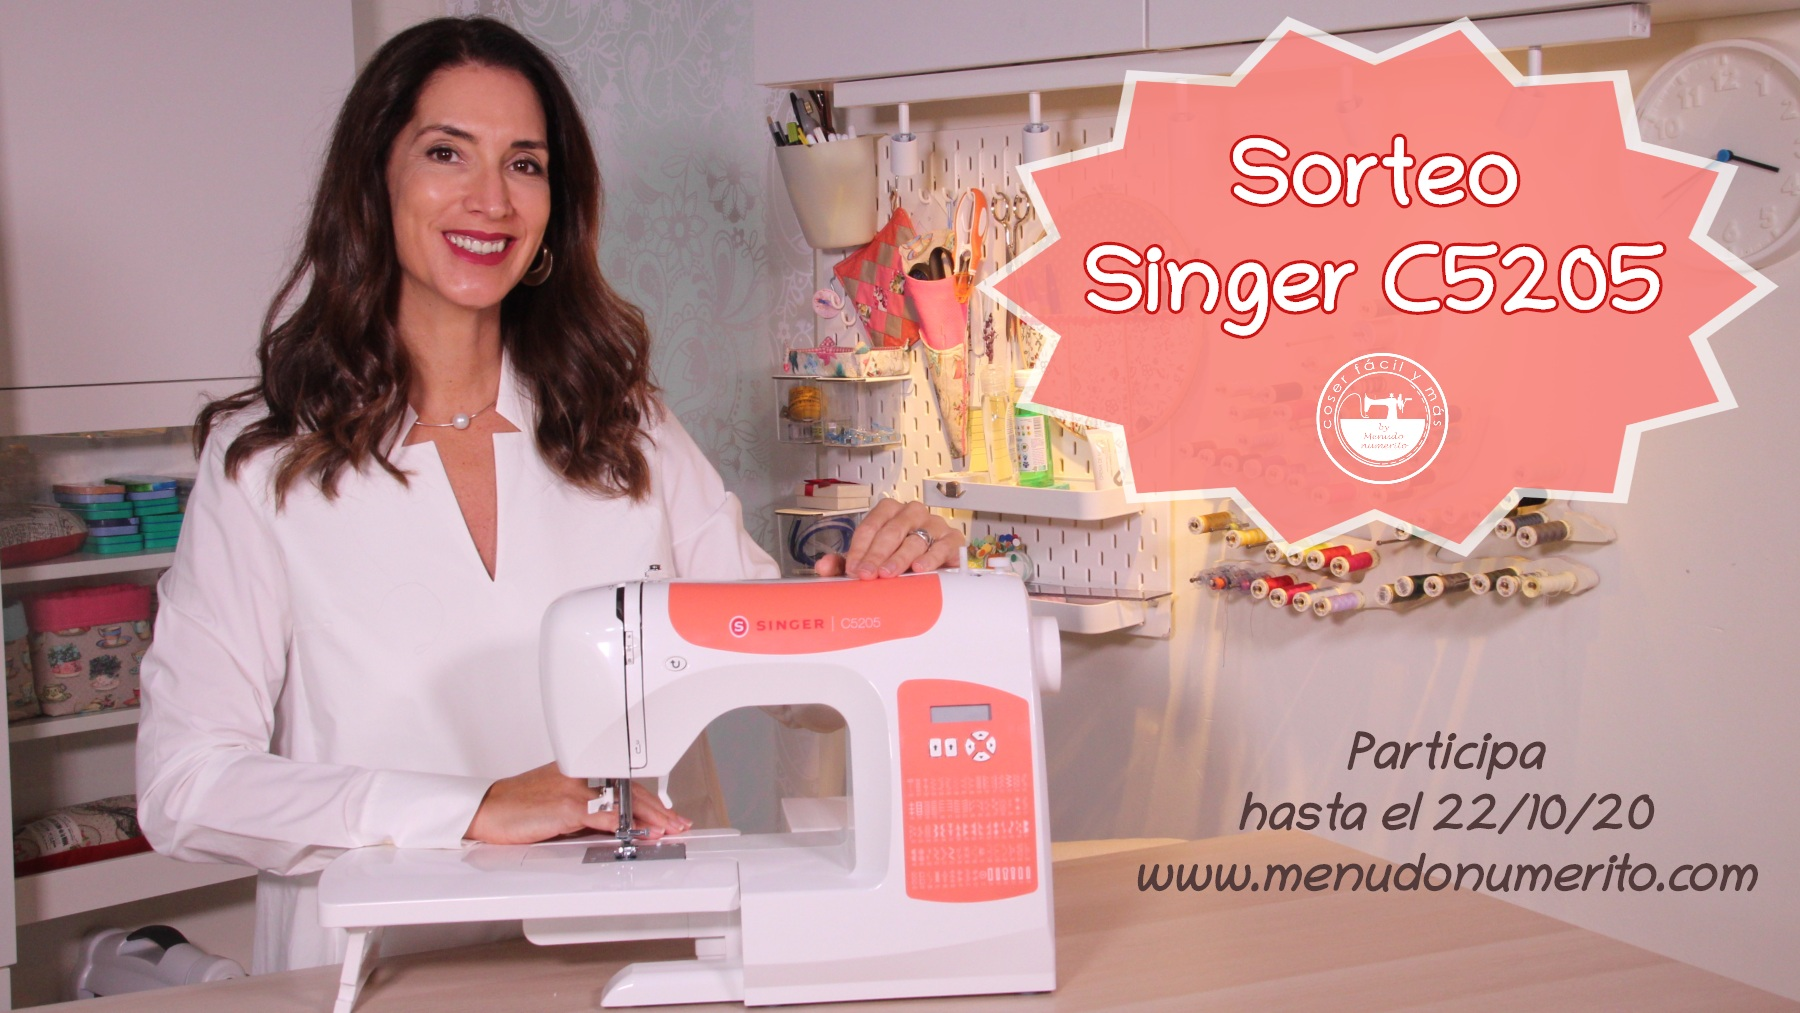 sorteo singer c5205 menudo numerito blogs de costura